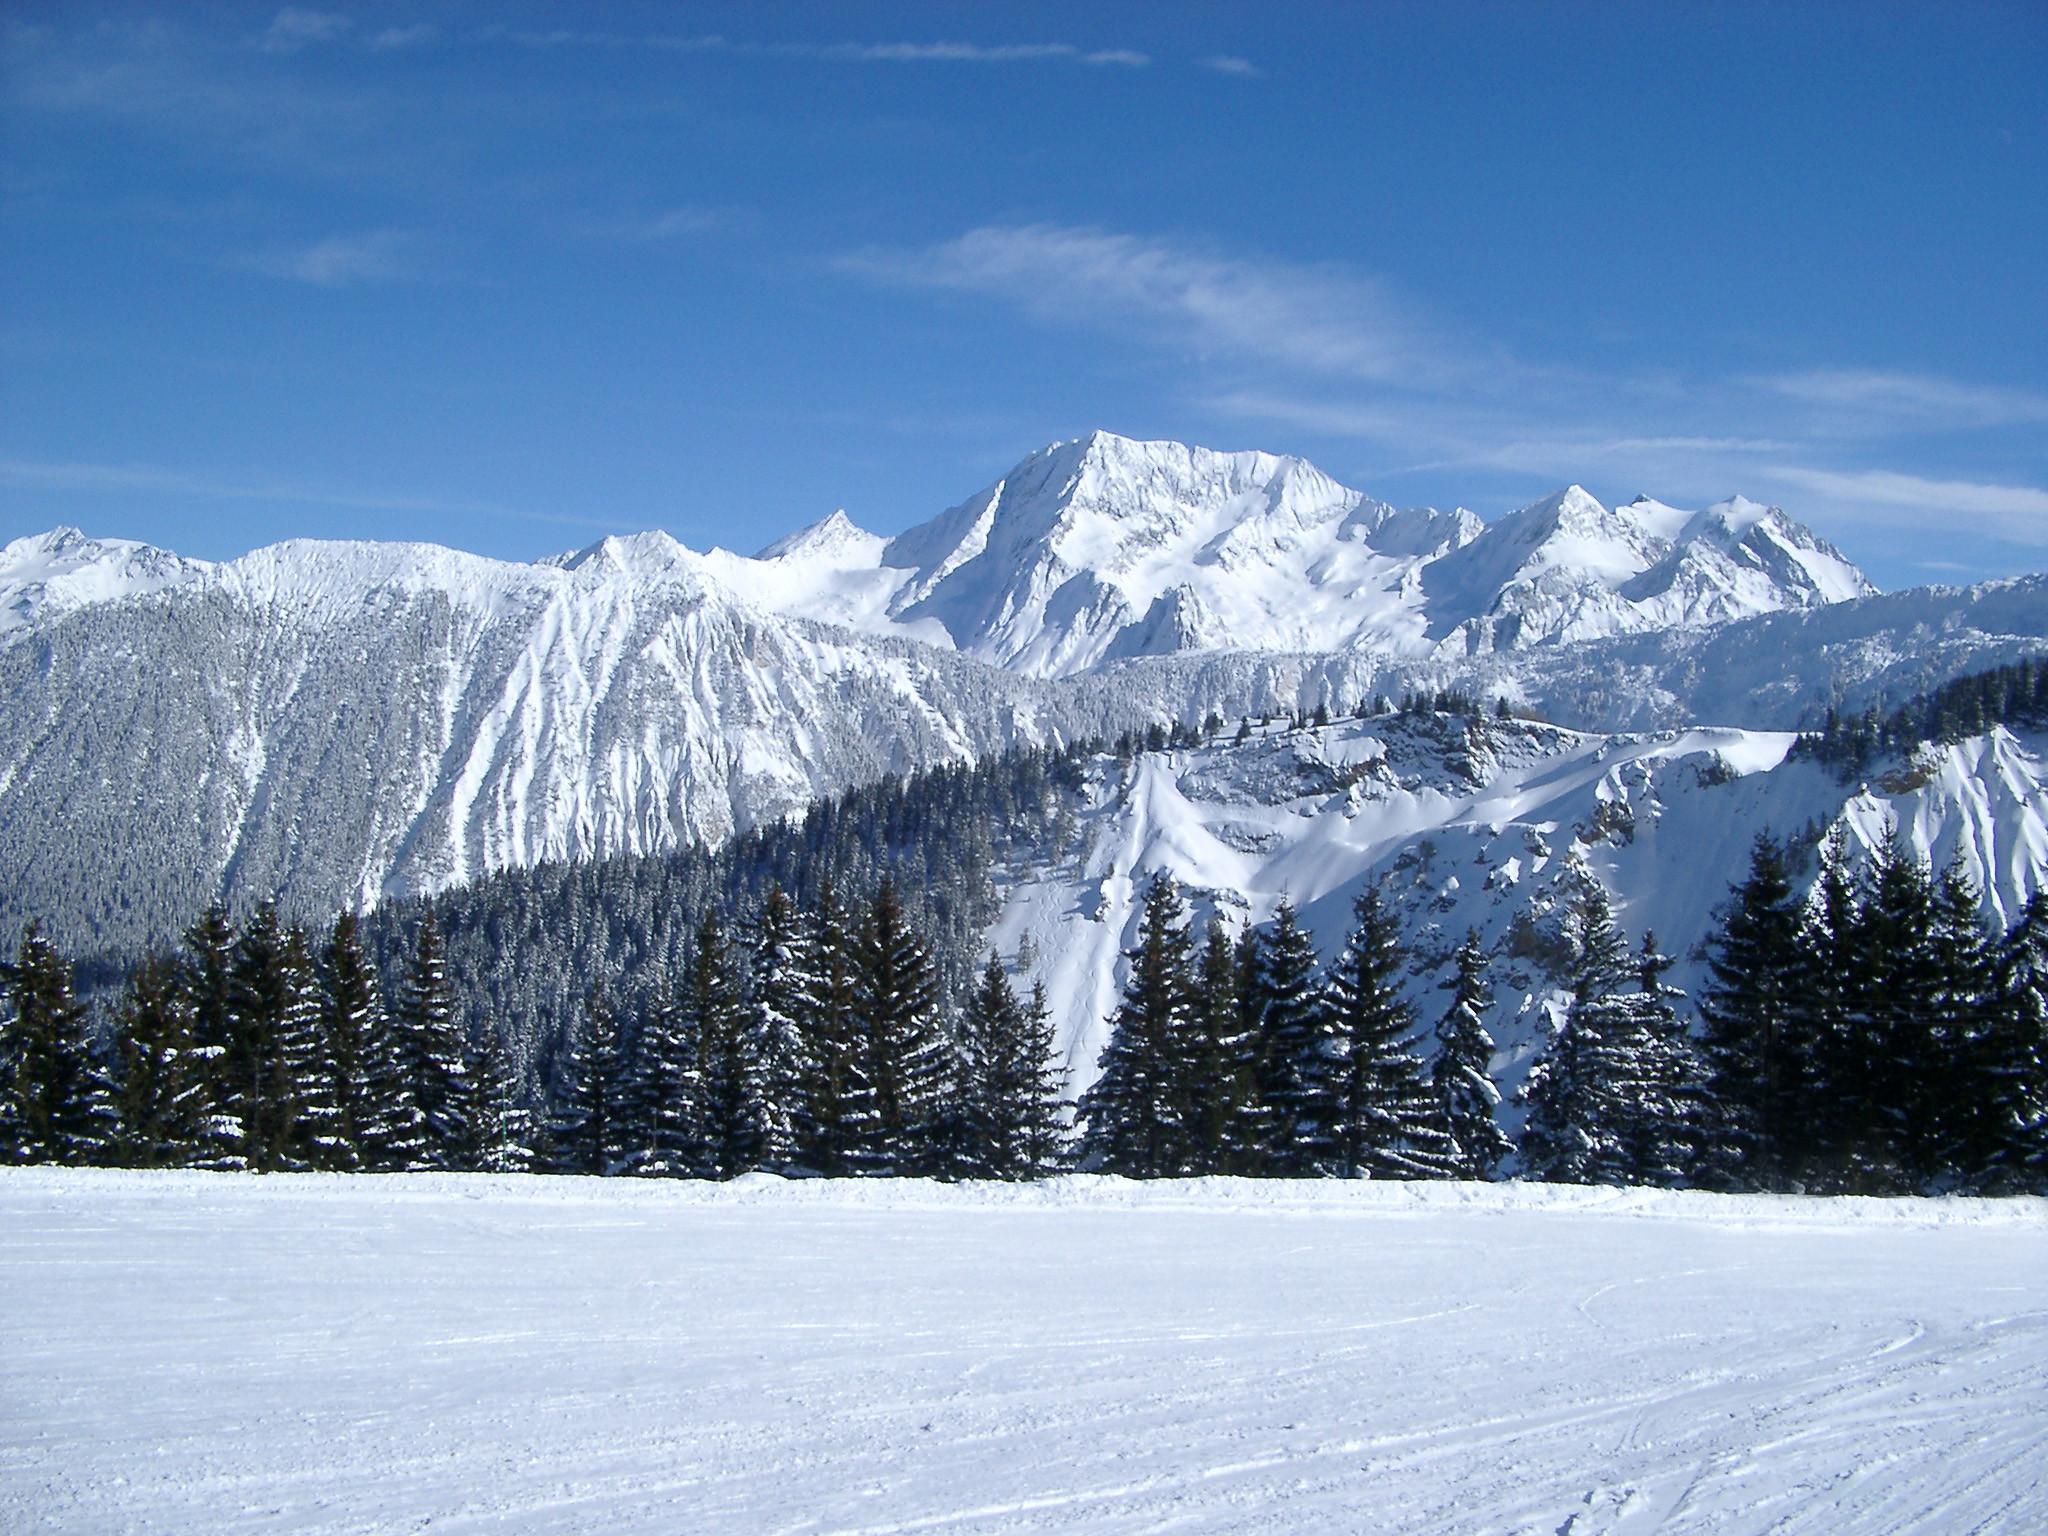 Winter Mountain Scenes | HD Walls | Find Wallpapers